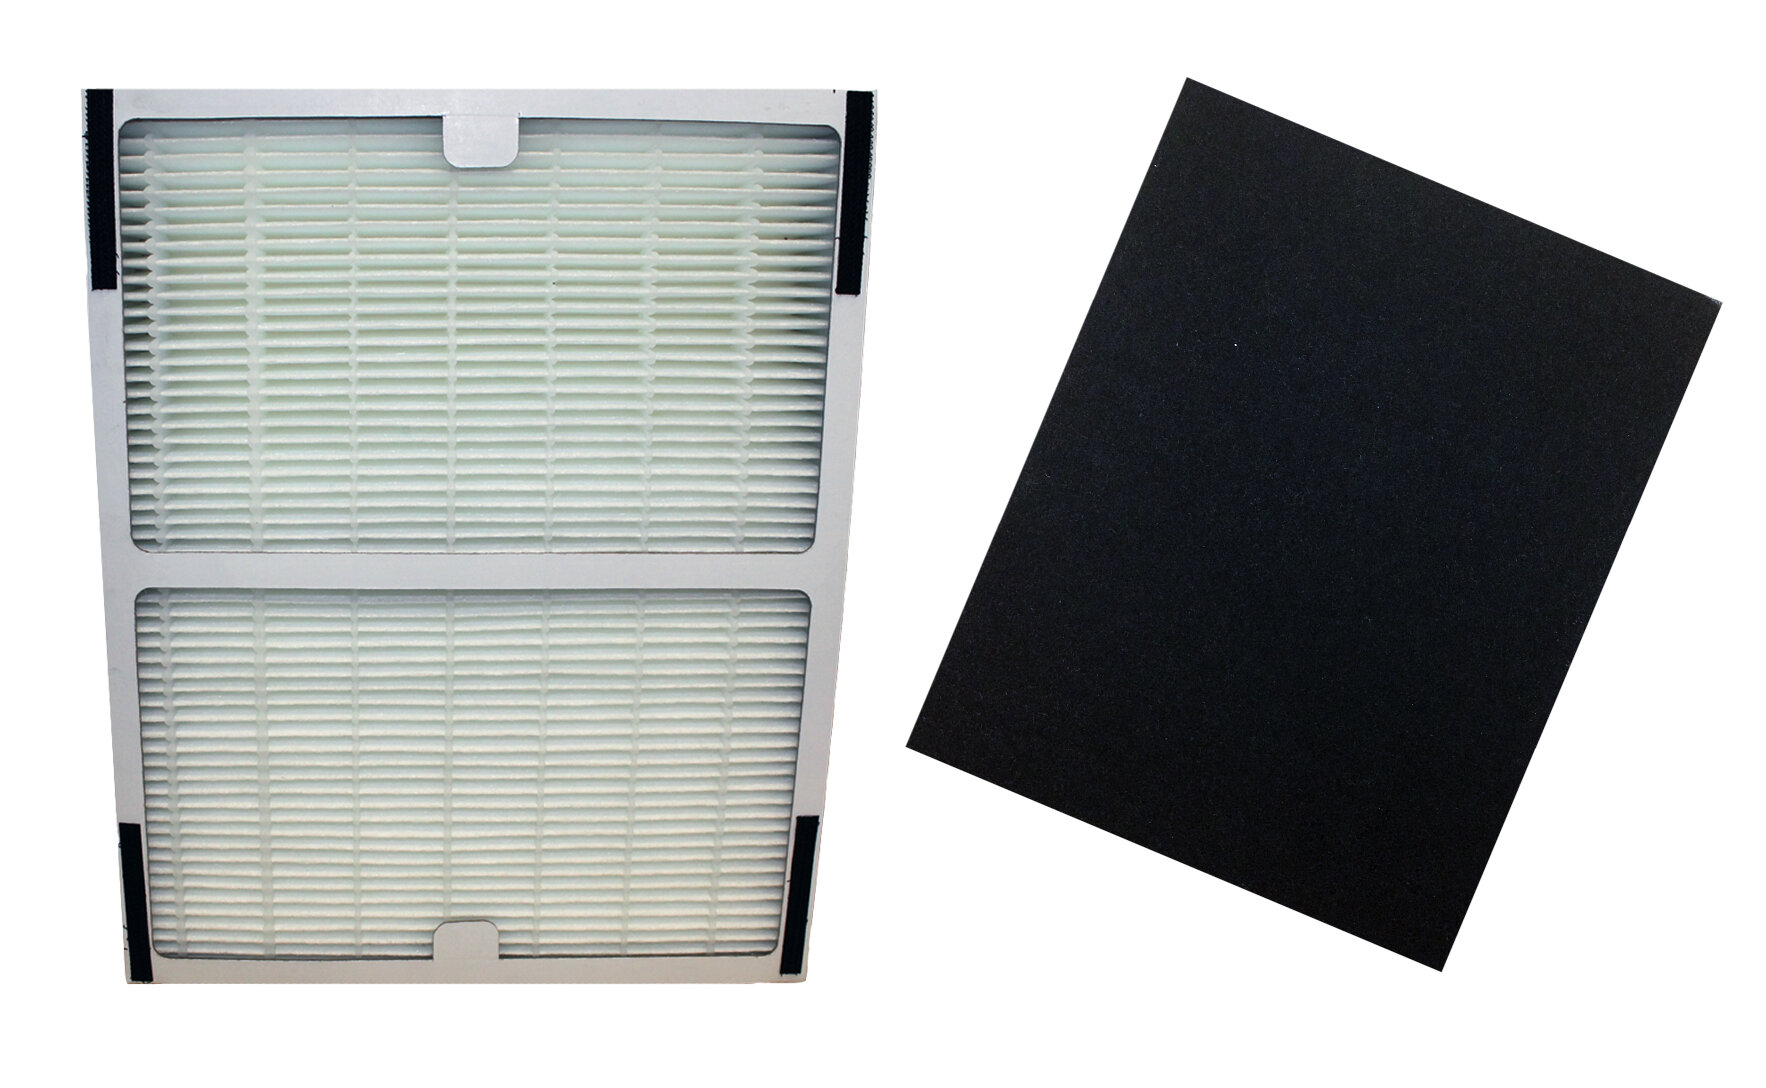 Idylis A HEPA Air Purifier and Carbon Filter Set